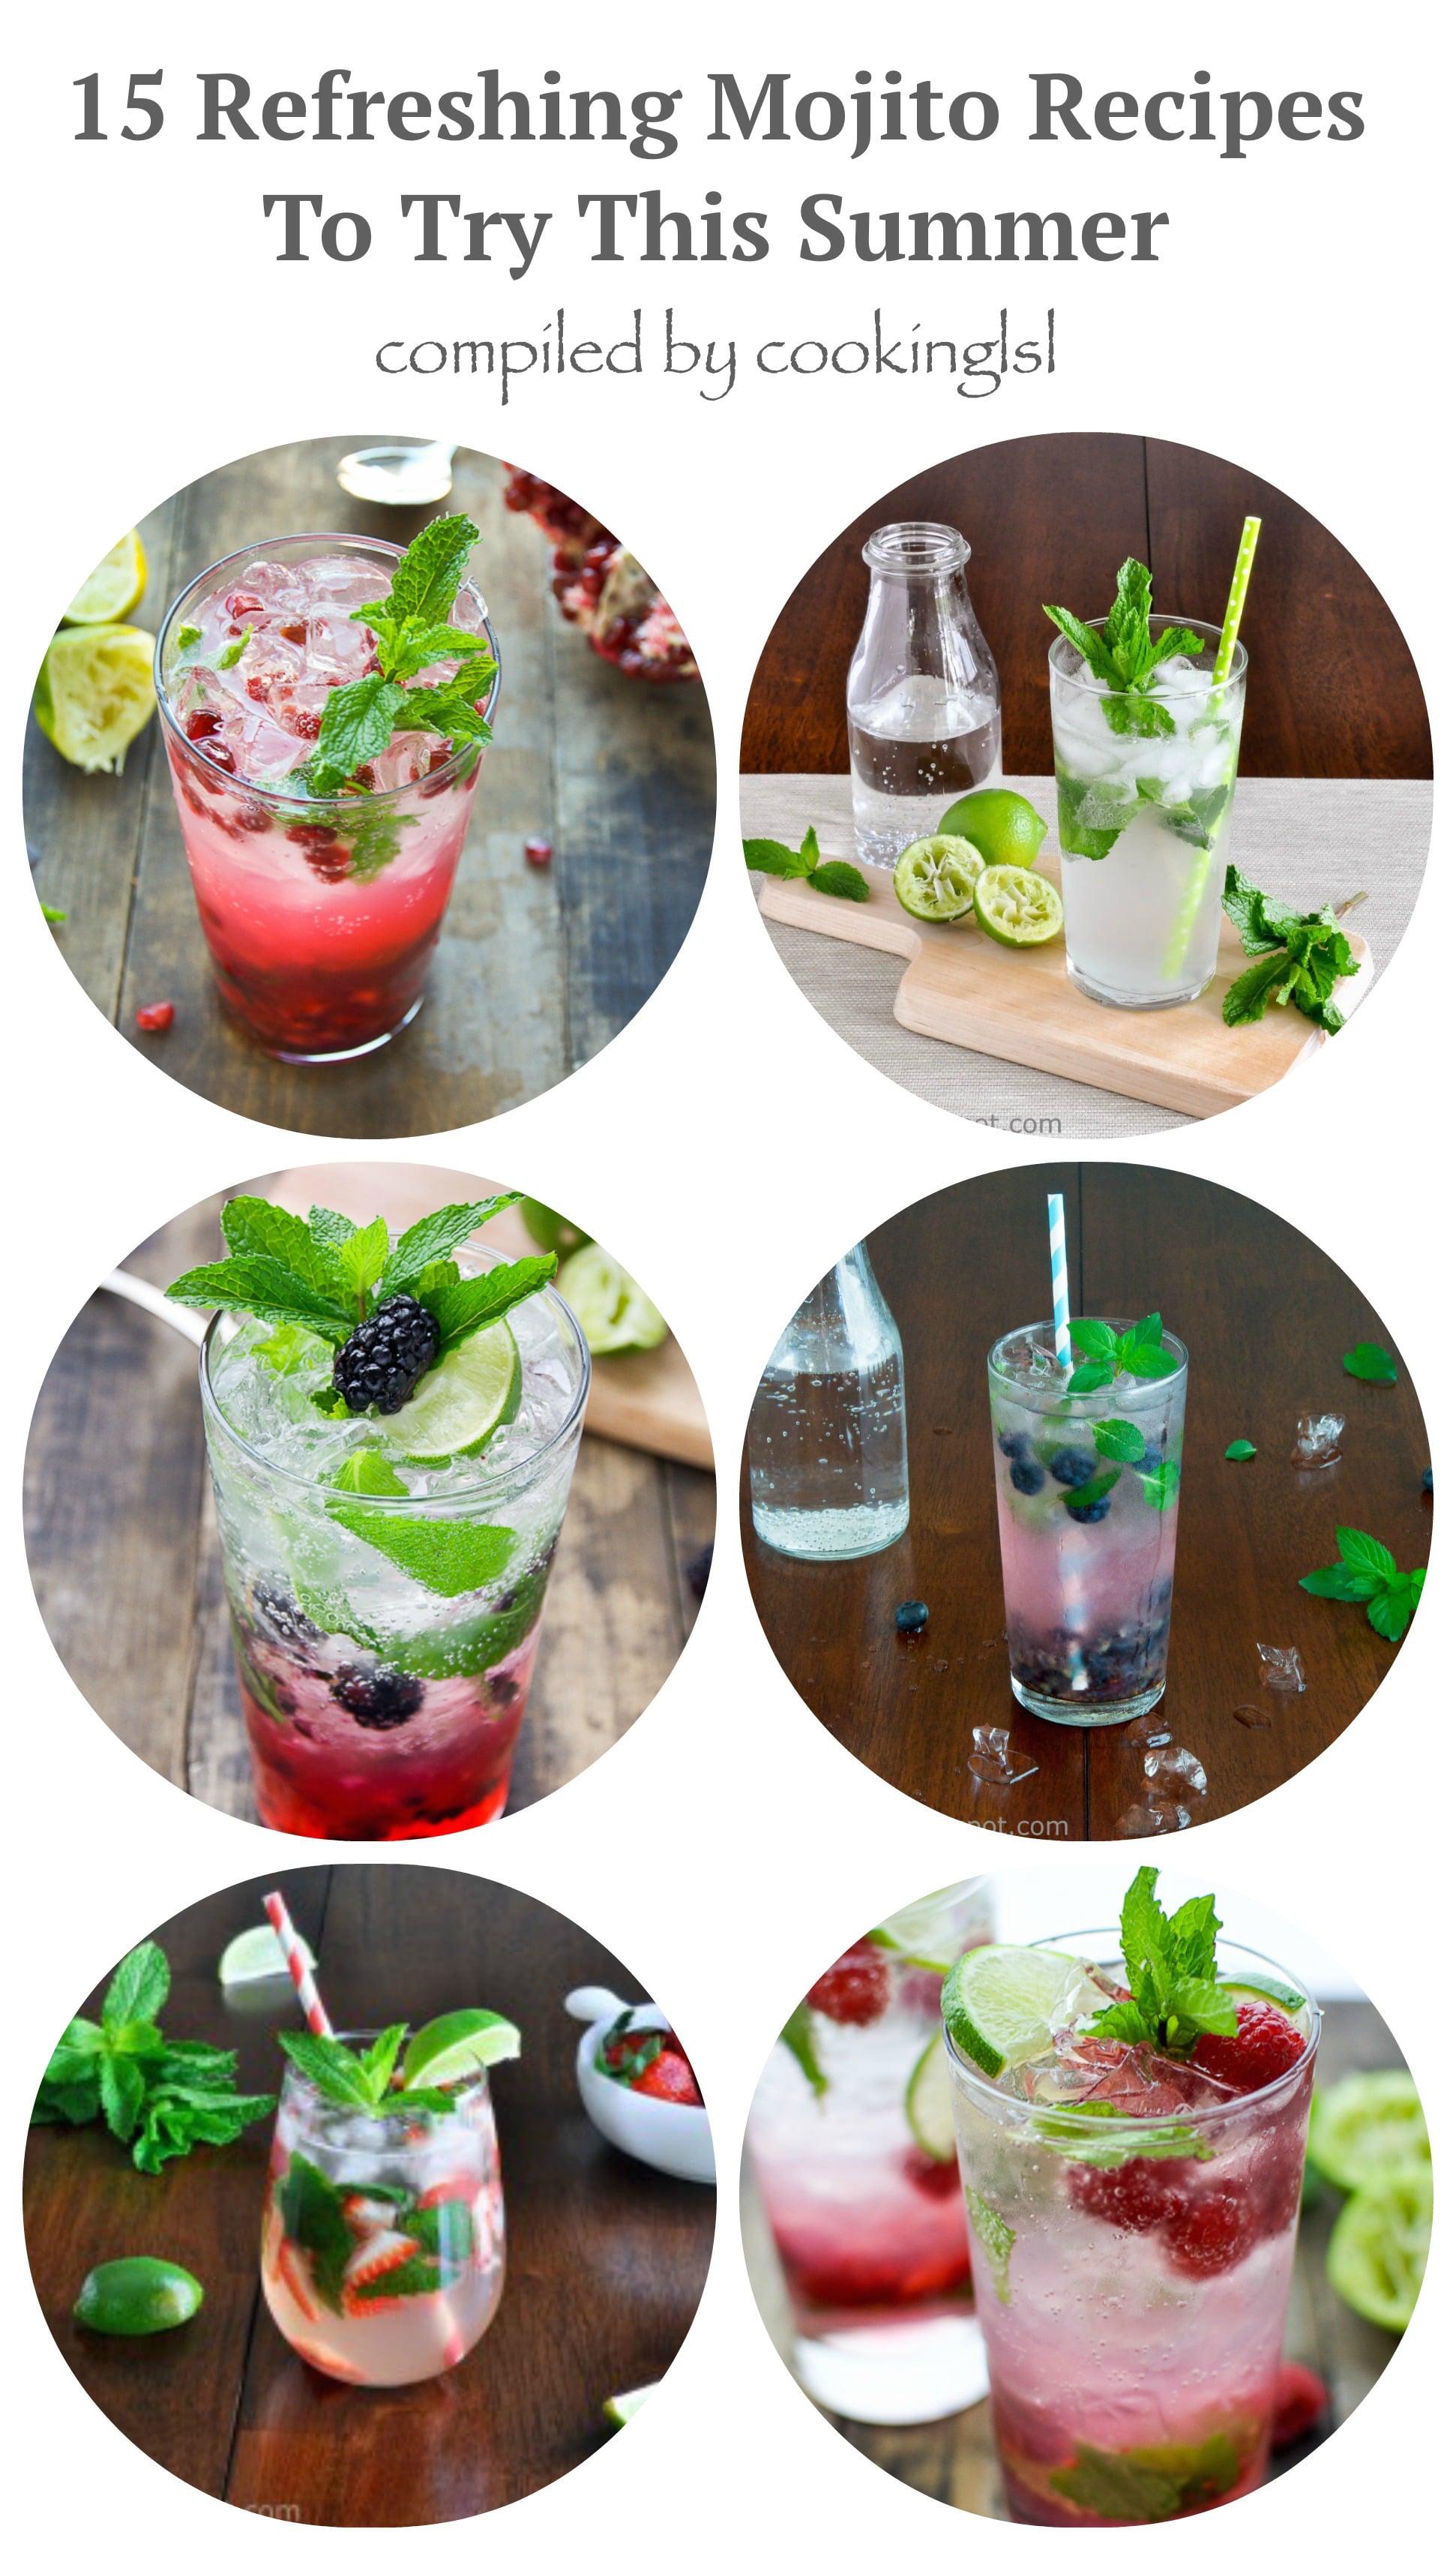 15-refreshing-mojito-recipes